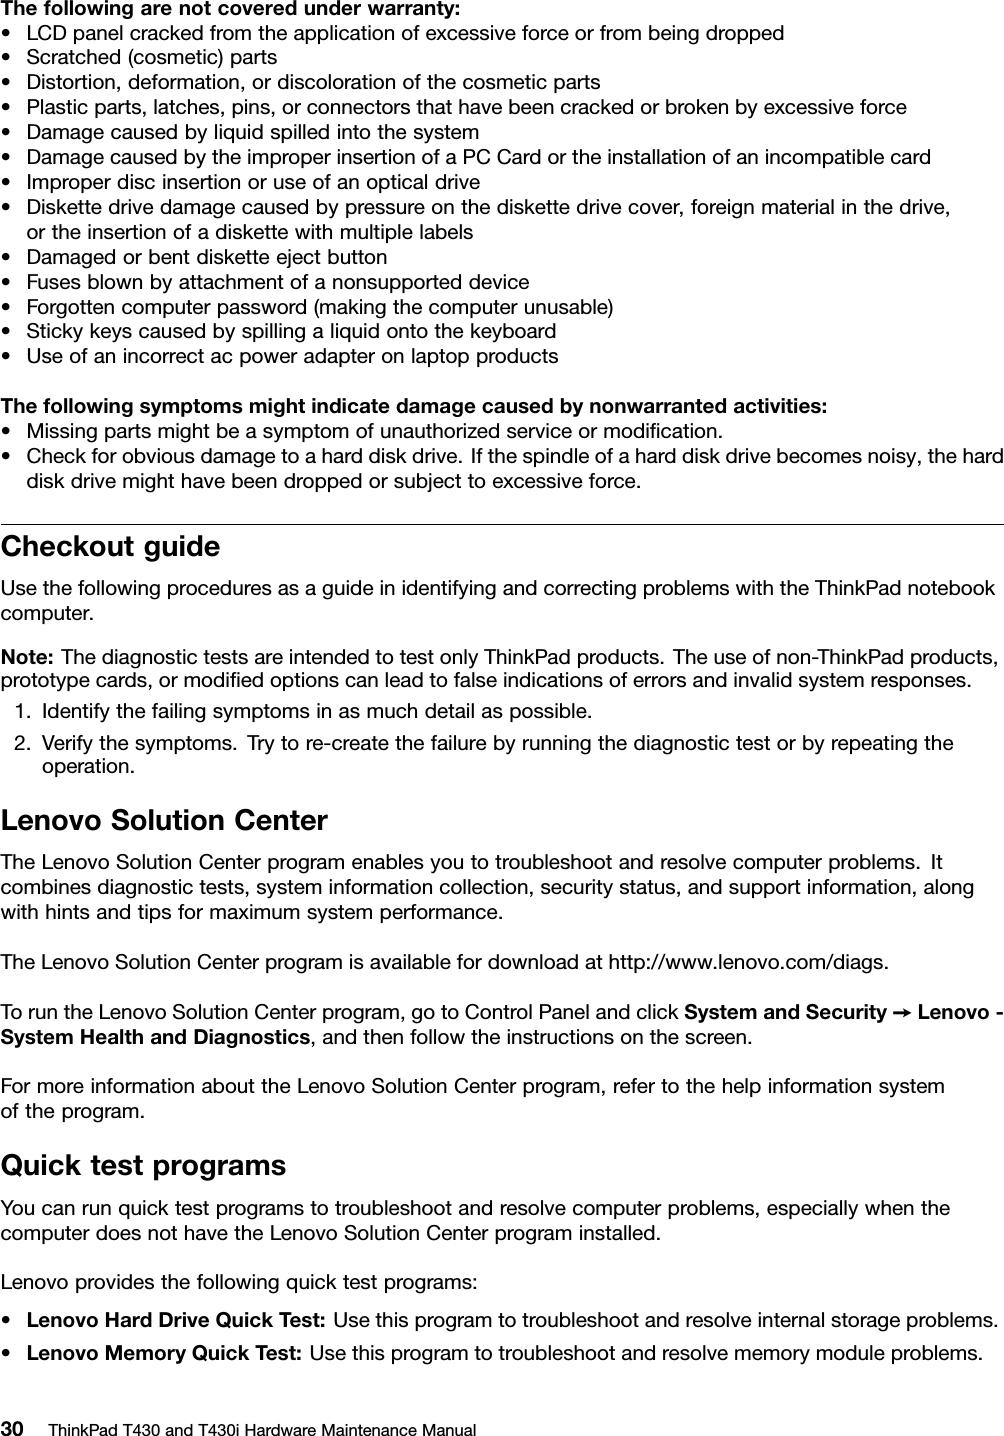 Lenovo T430 T430I Hmm En 0B48304 04 User Manual Hardware Maintenance